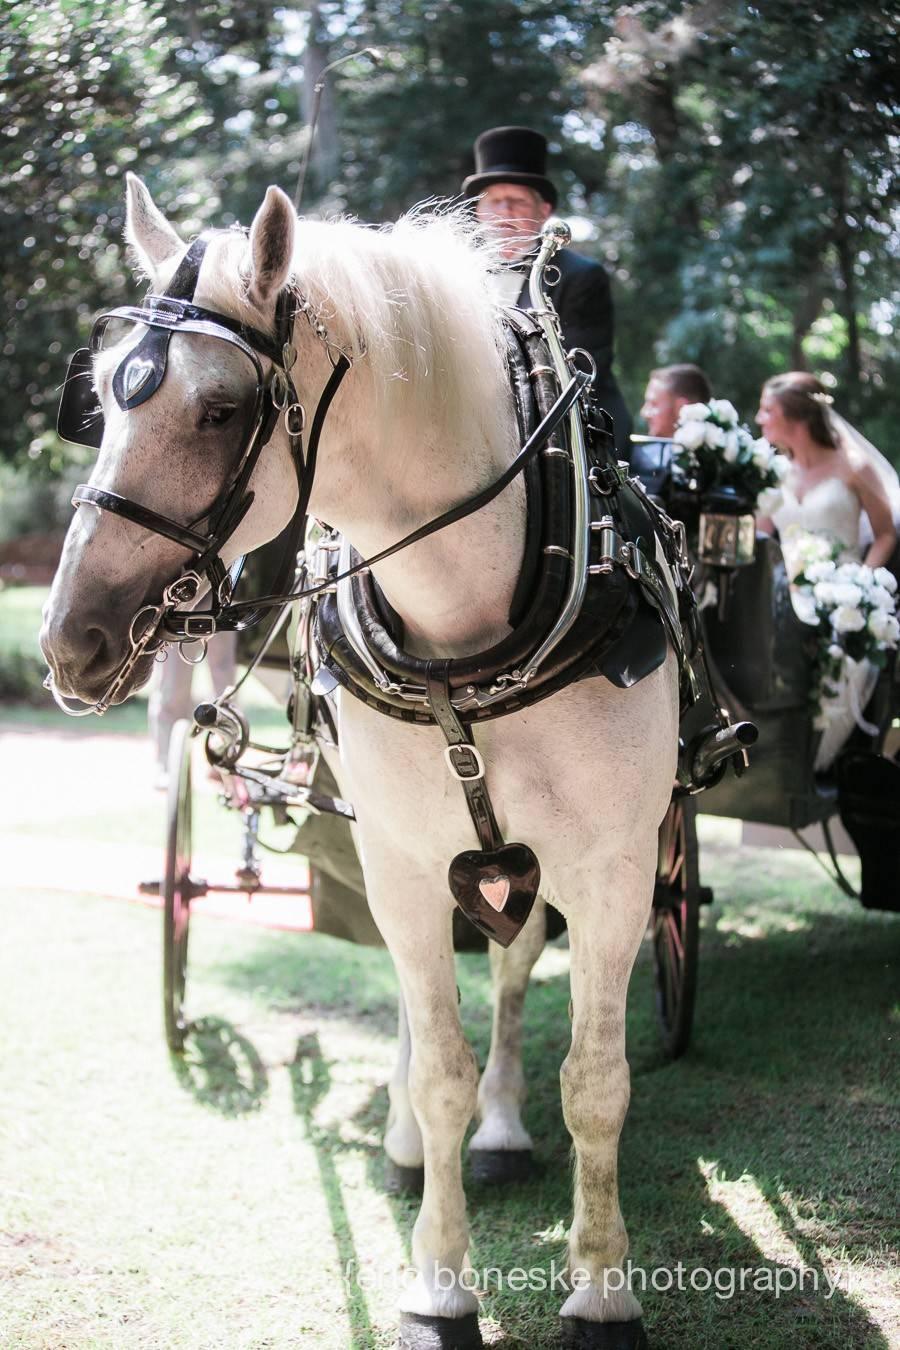 airlie-gardens-weddings-eric-boneske3-photography-1